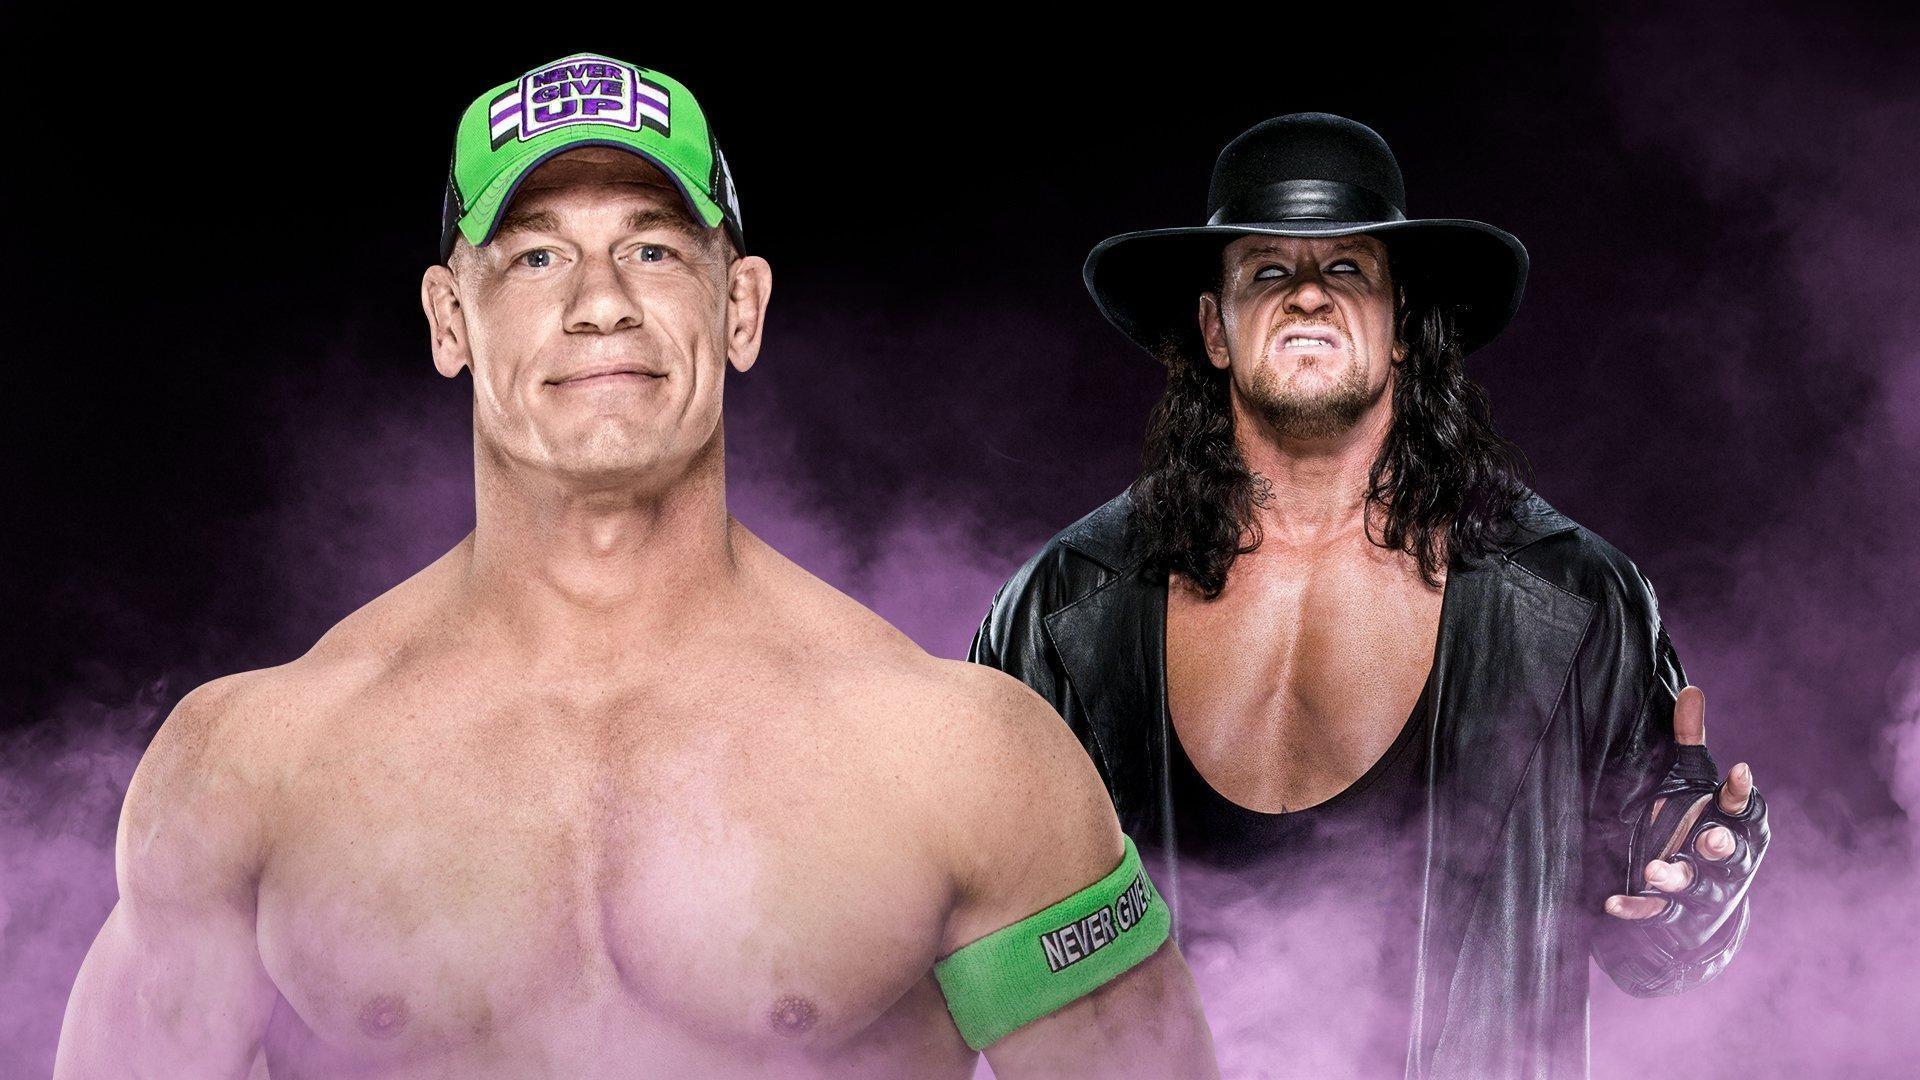 wwe undertaker vs john cena wallpapers